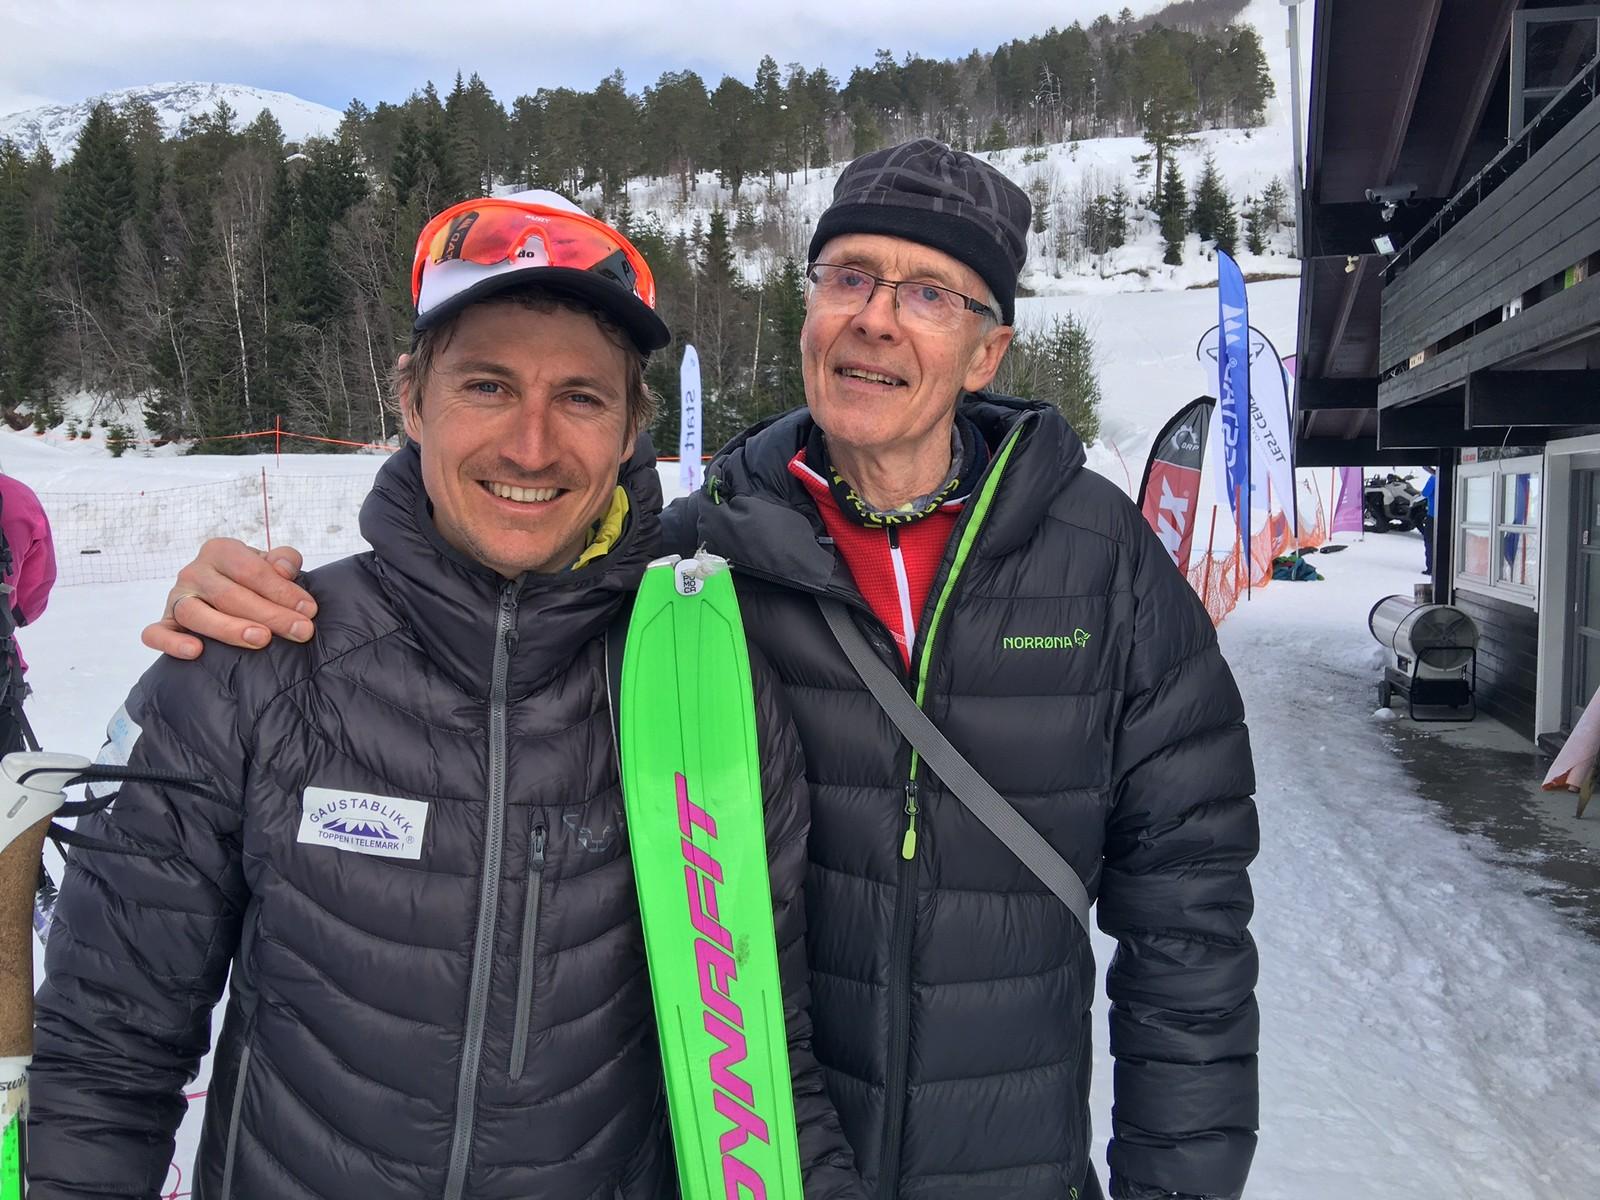 Lars Eirik Skjervheim får ein velfortent klapp på skuldra av pappa Lars Skjervheim.